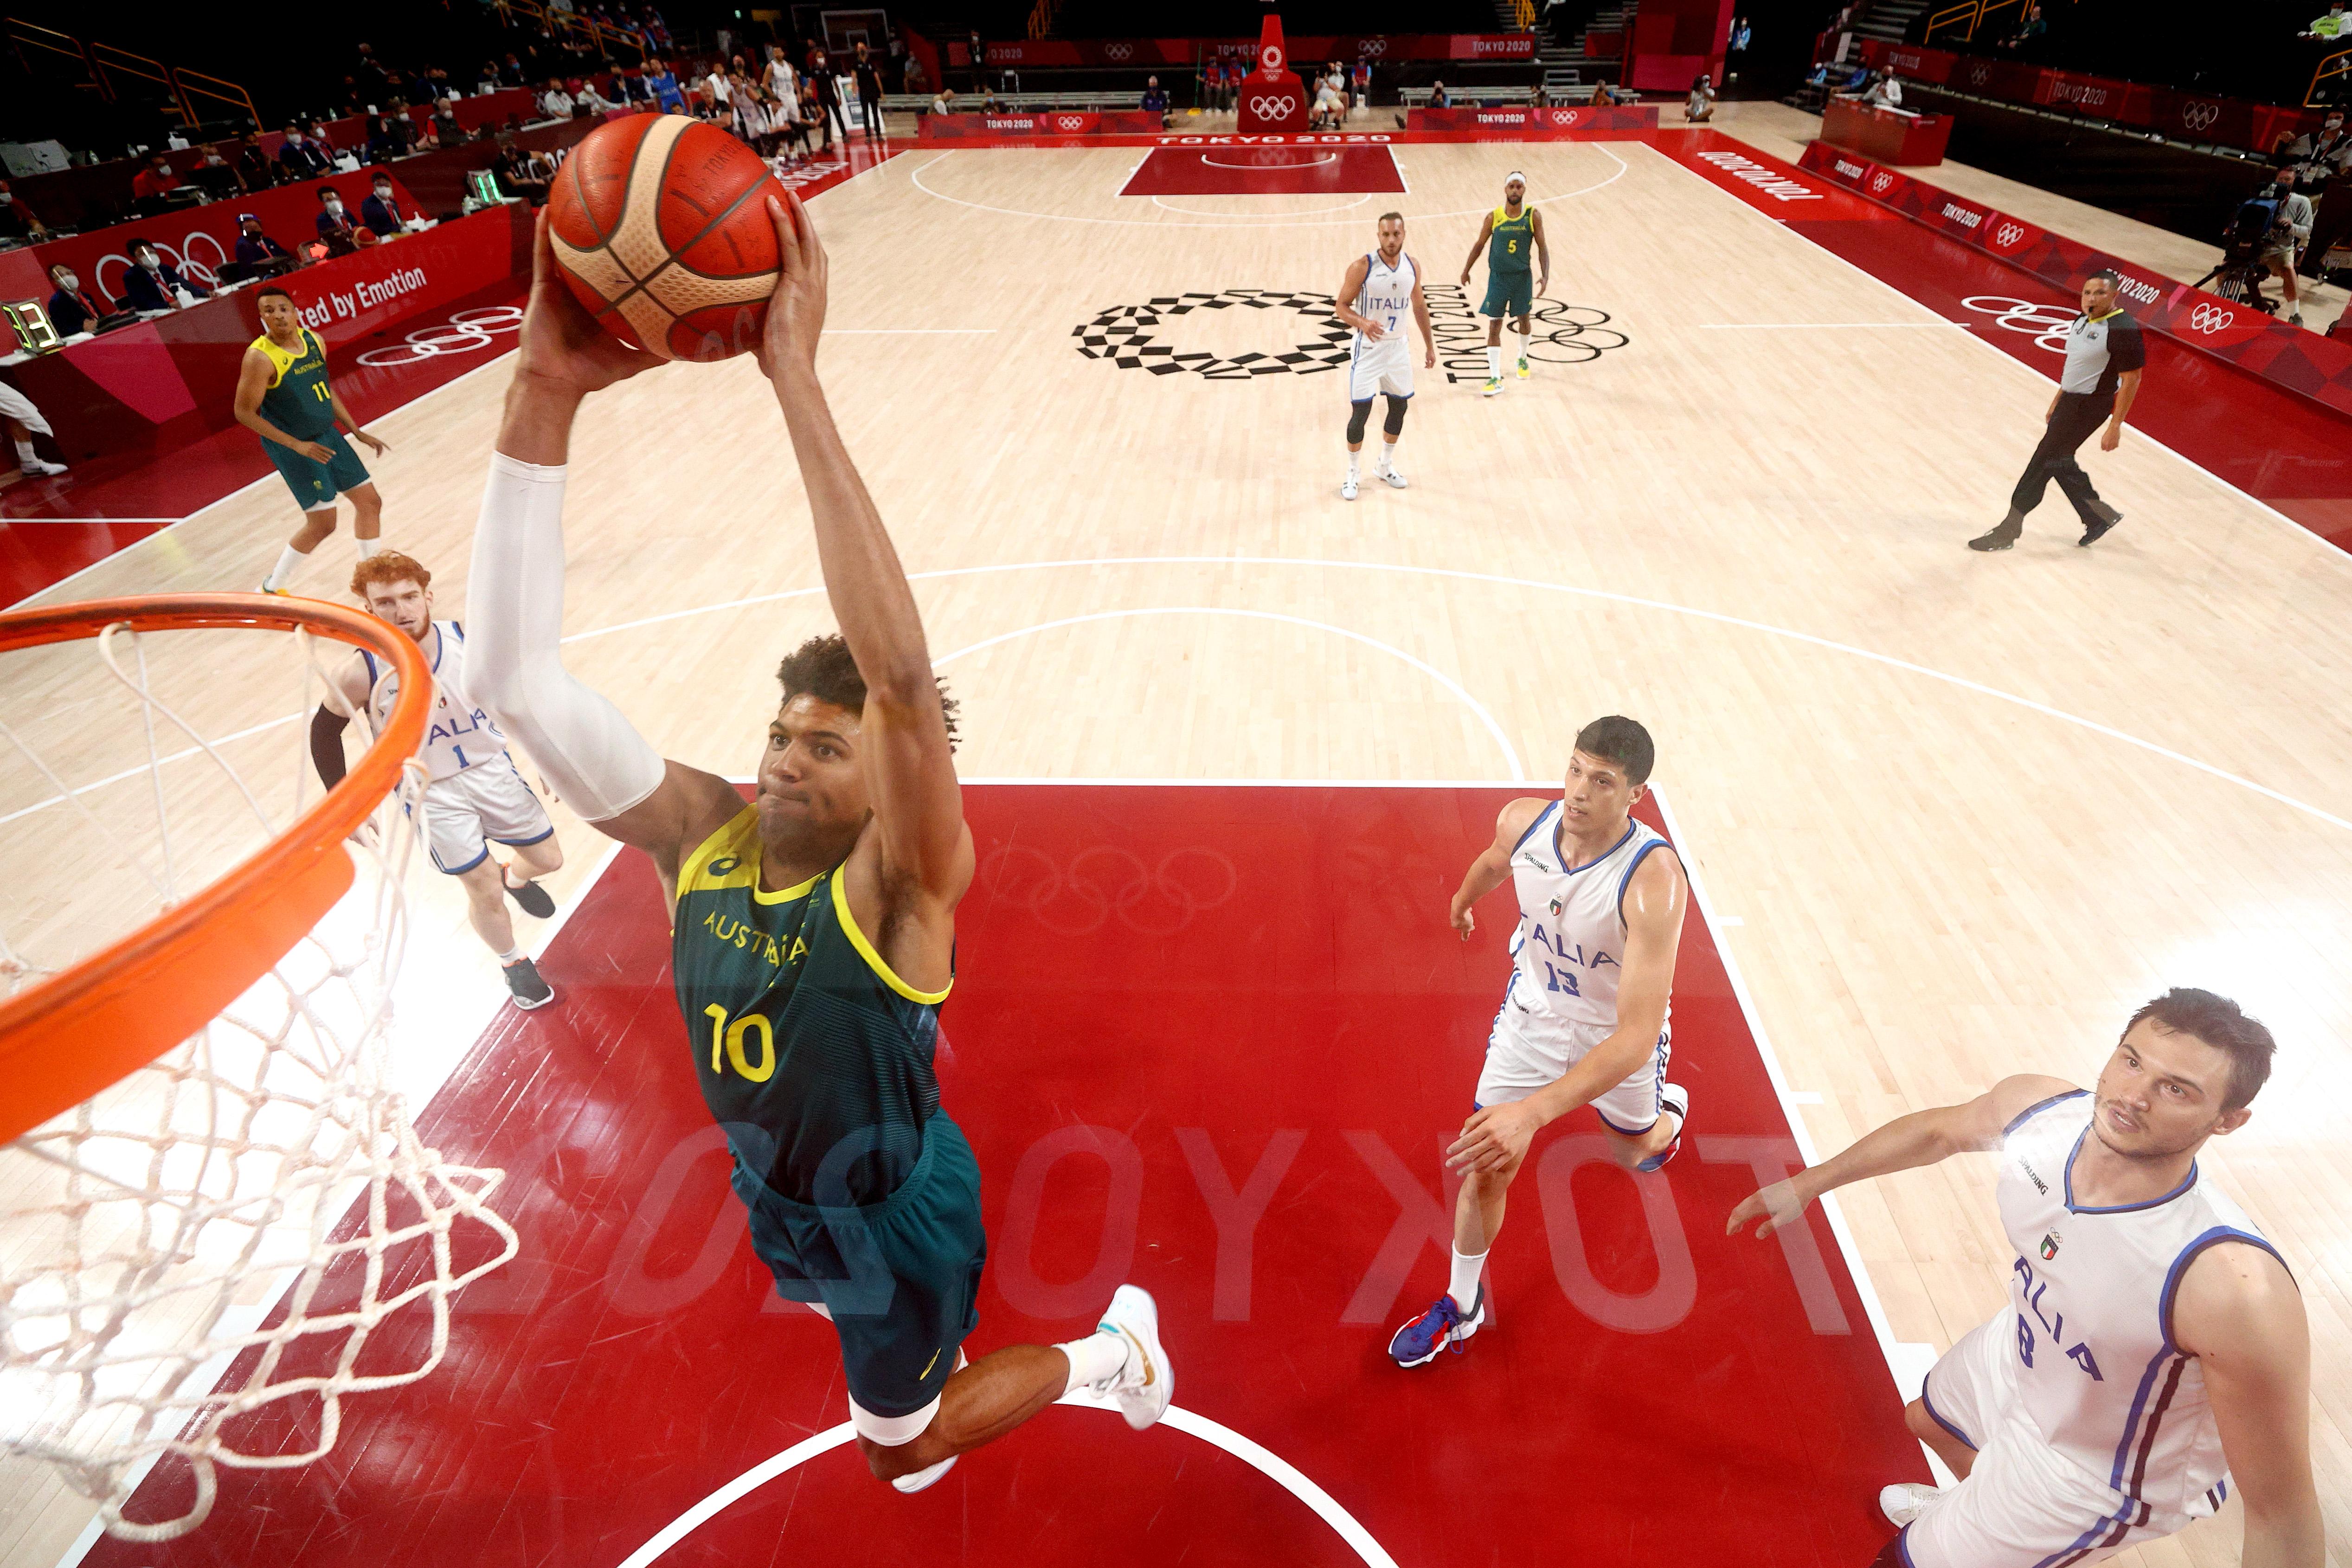 Italy v Australia Men's Basketball - Olympics: Day 5